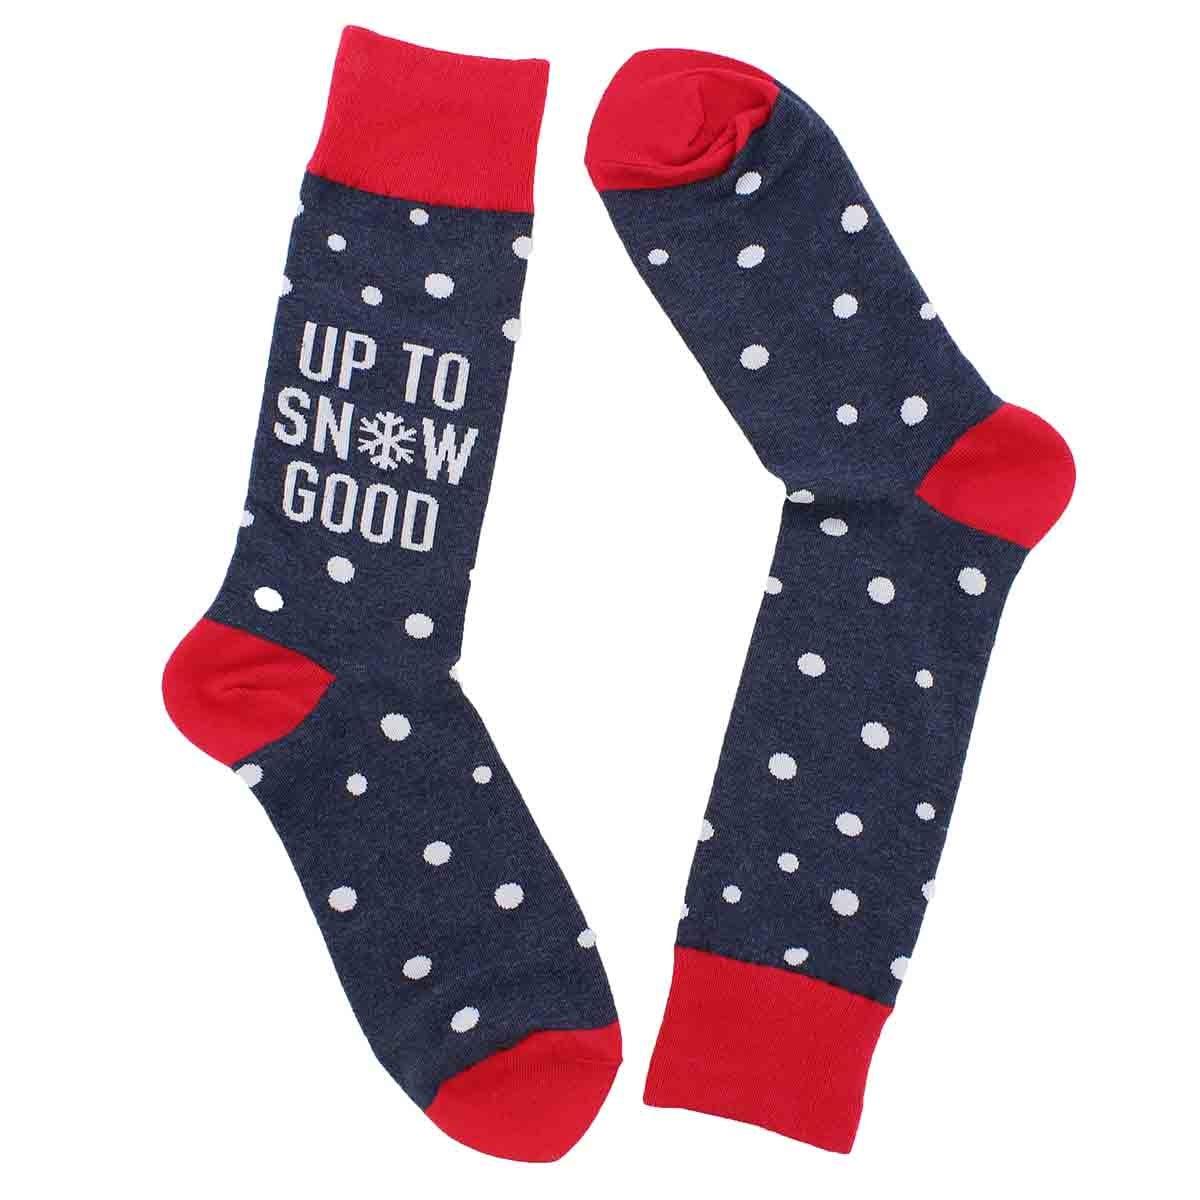 Mns Up To Snow Good grey printed sock